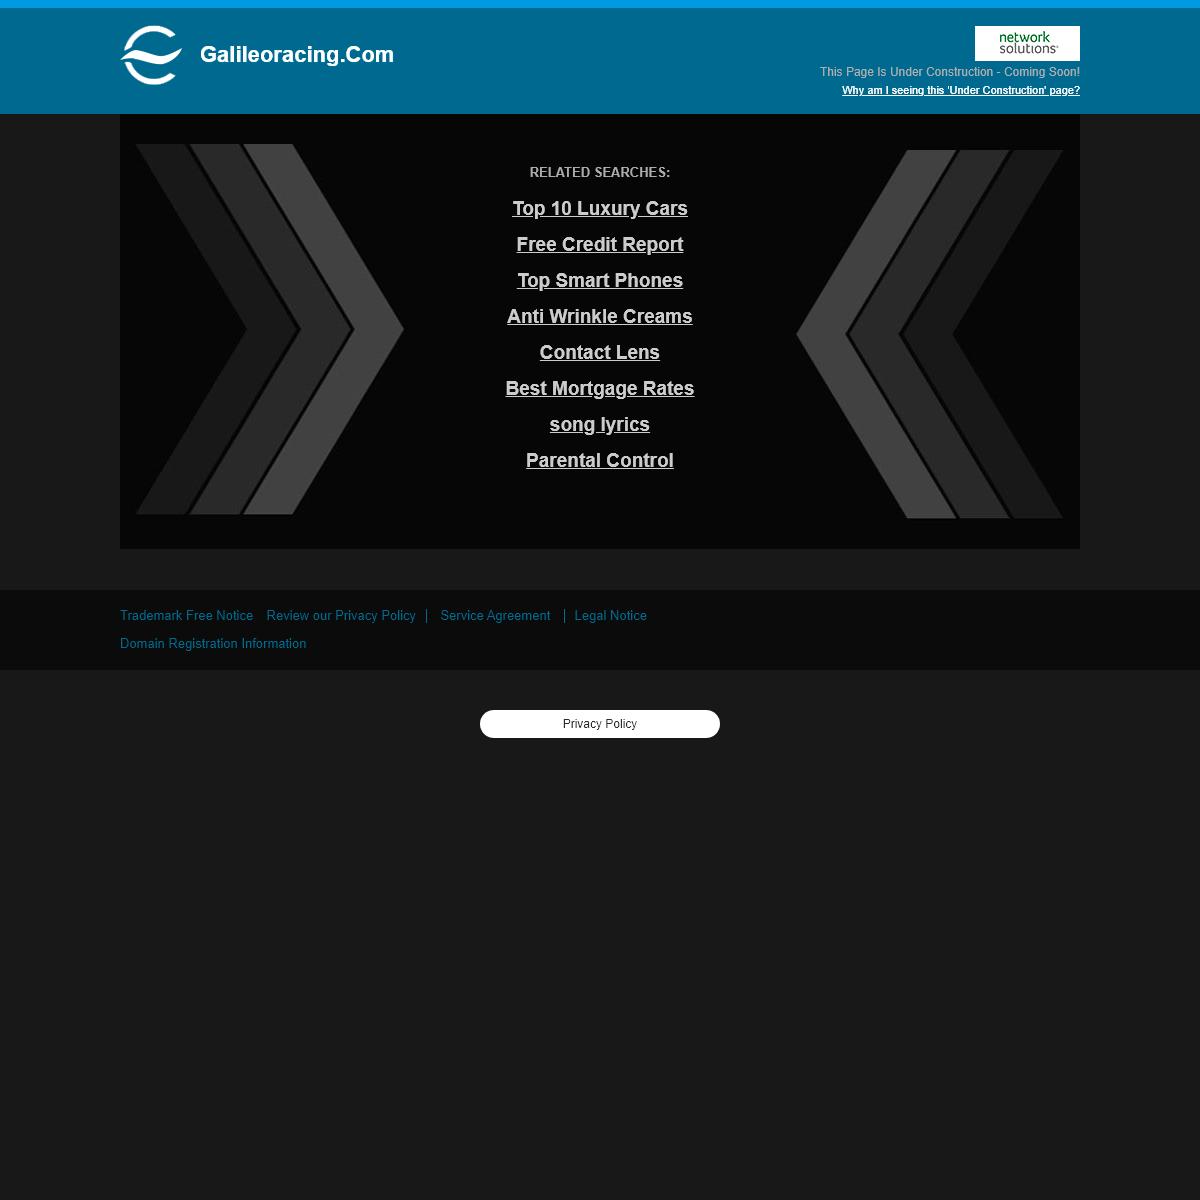 Galileoracing.com